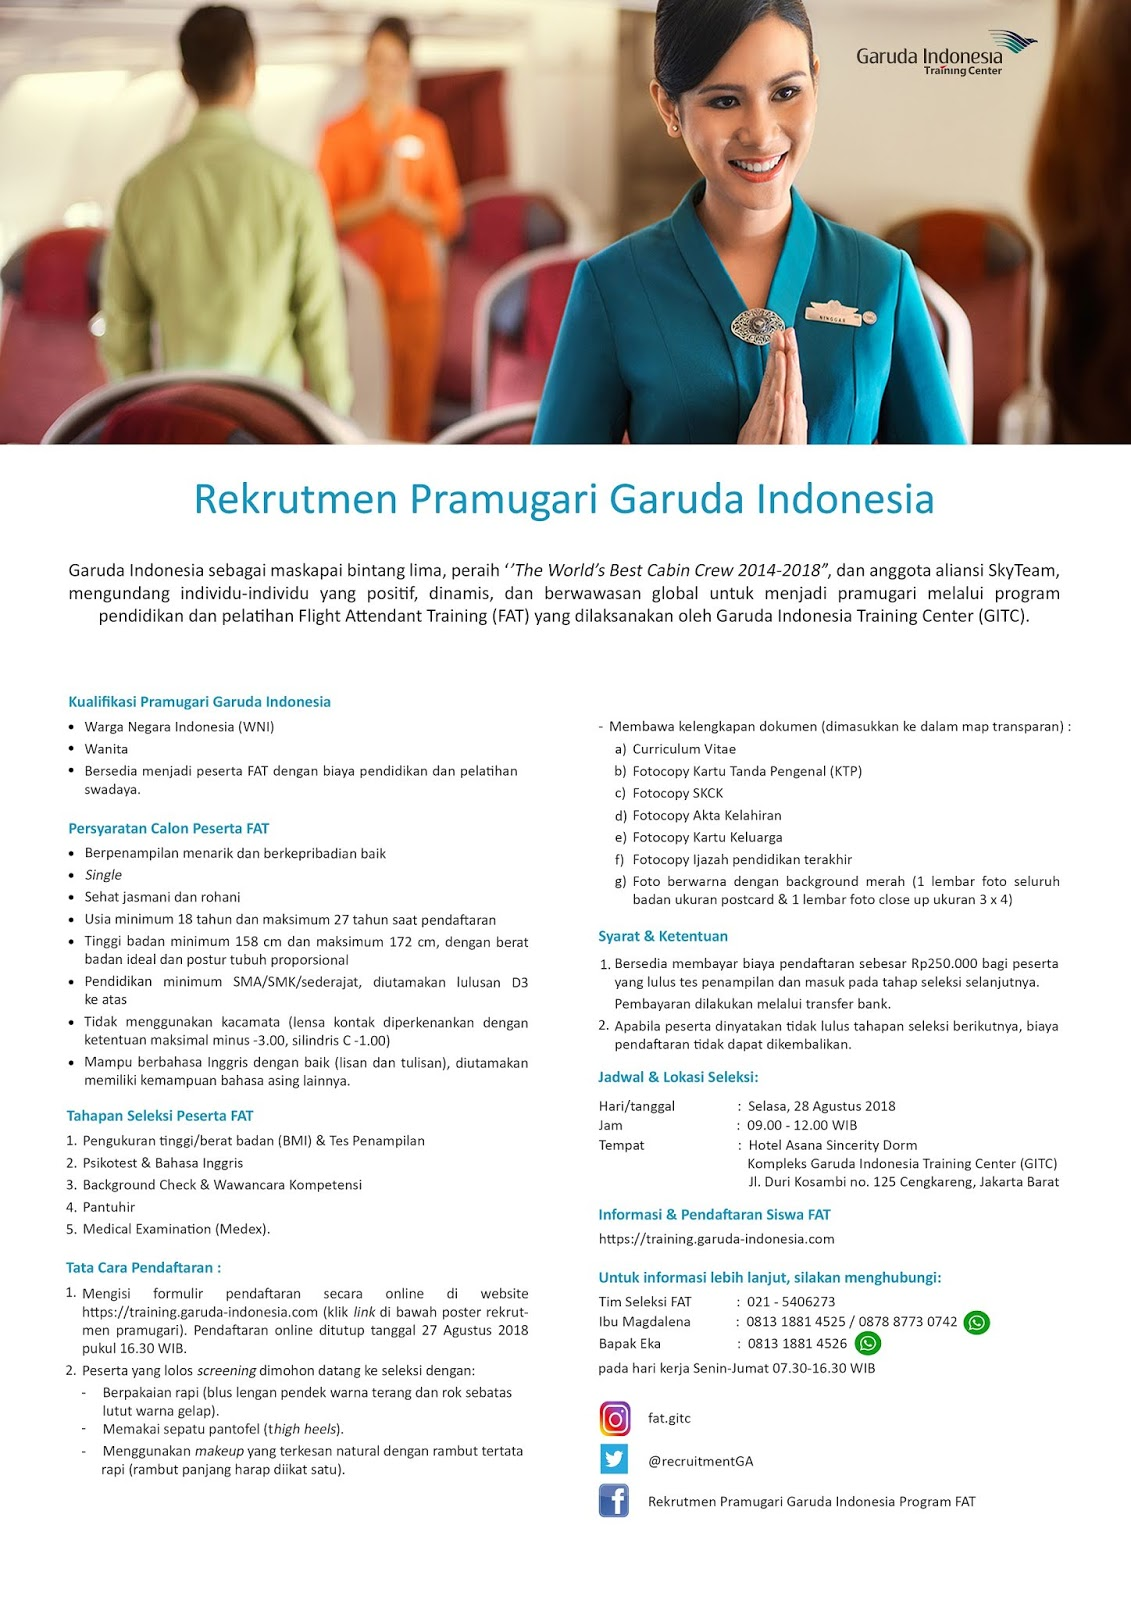 Lowongan Pramugari 2019 : lowongan, pramugari, Rekrutmen, Pramugari, Garuda, Indonesia, Lowongan, Kerja, Bulan, Maret